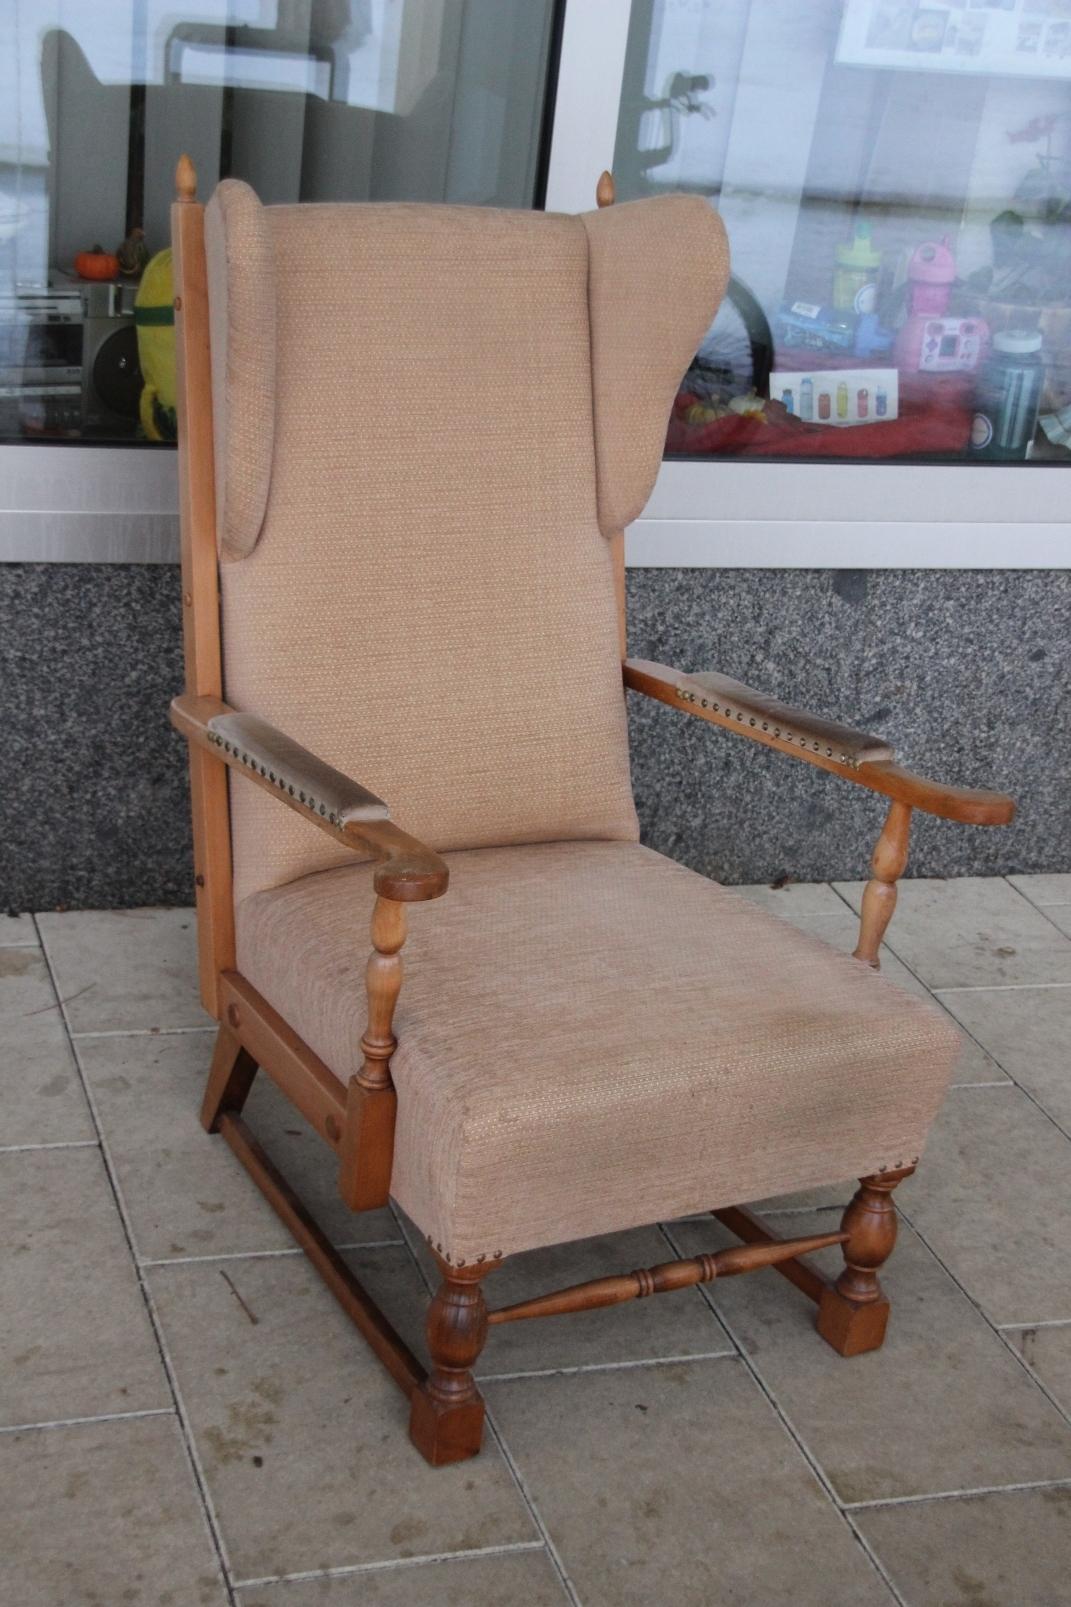 Ohrensessel ikea braun  Ikea Ohrensessel Strandmon Gebraucht: Sessel blau: seattle sessel ...